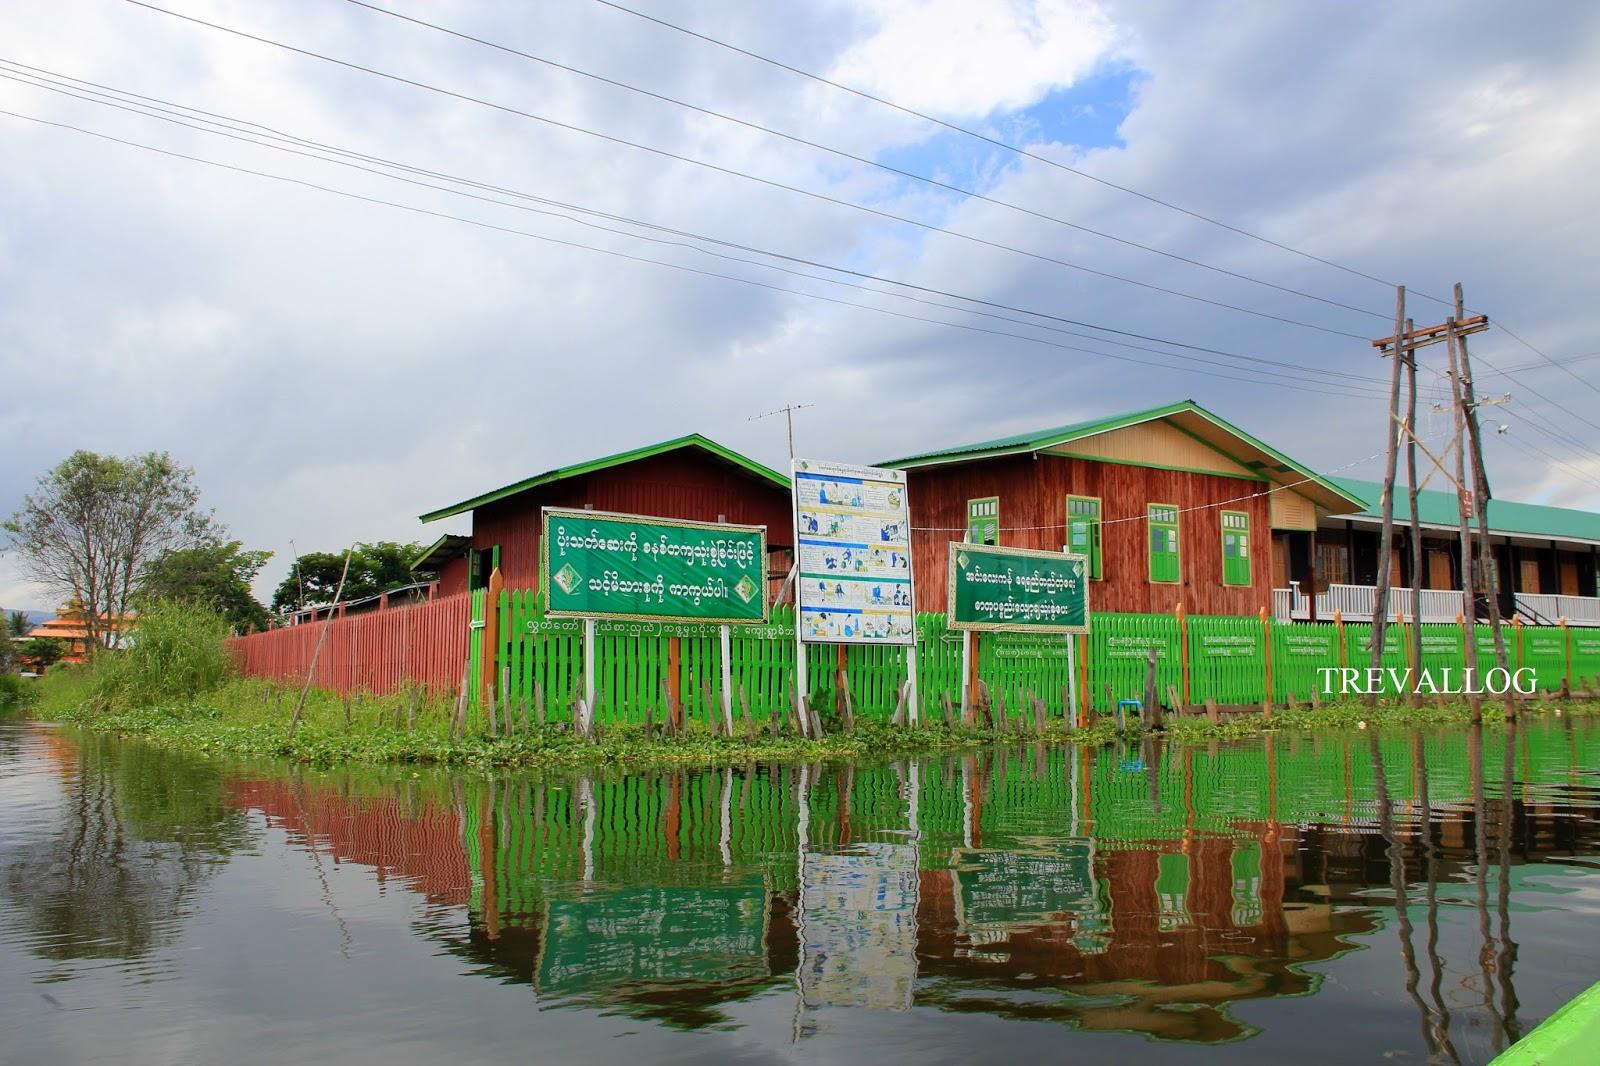 Beautiful school in Inle Lake, Myanmar.